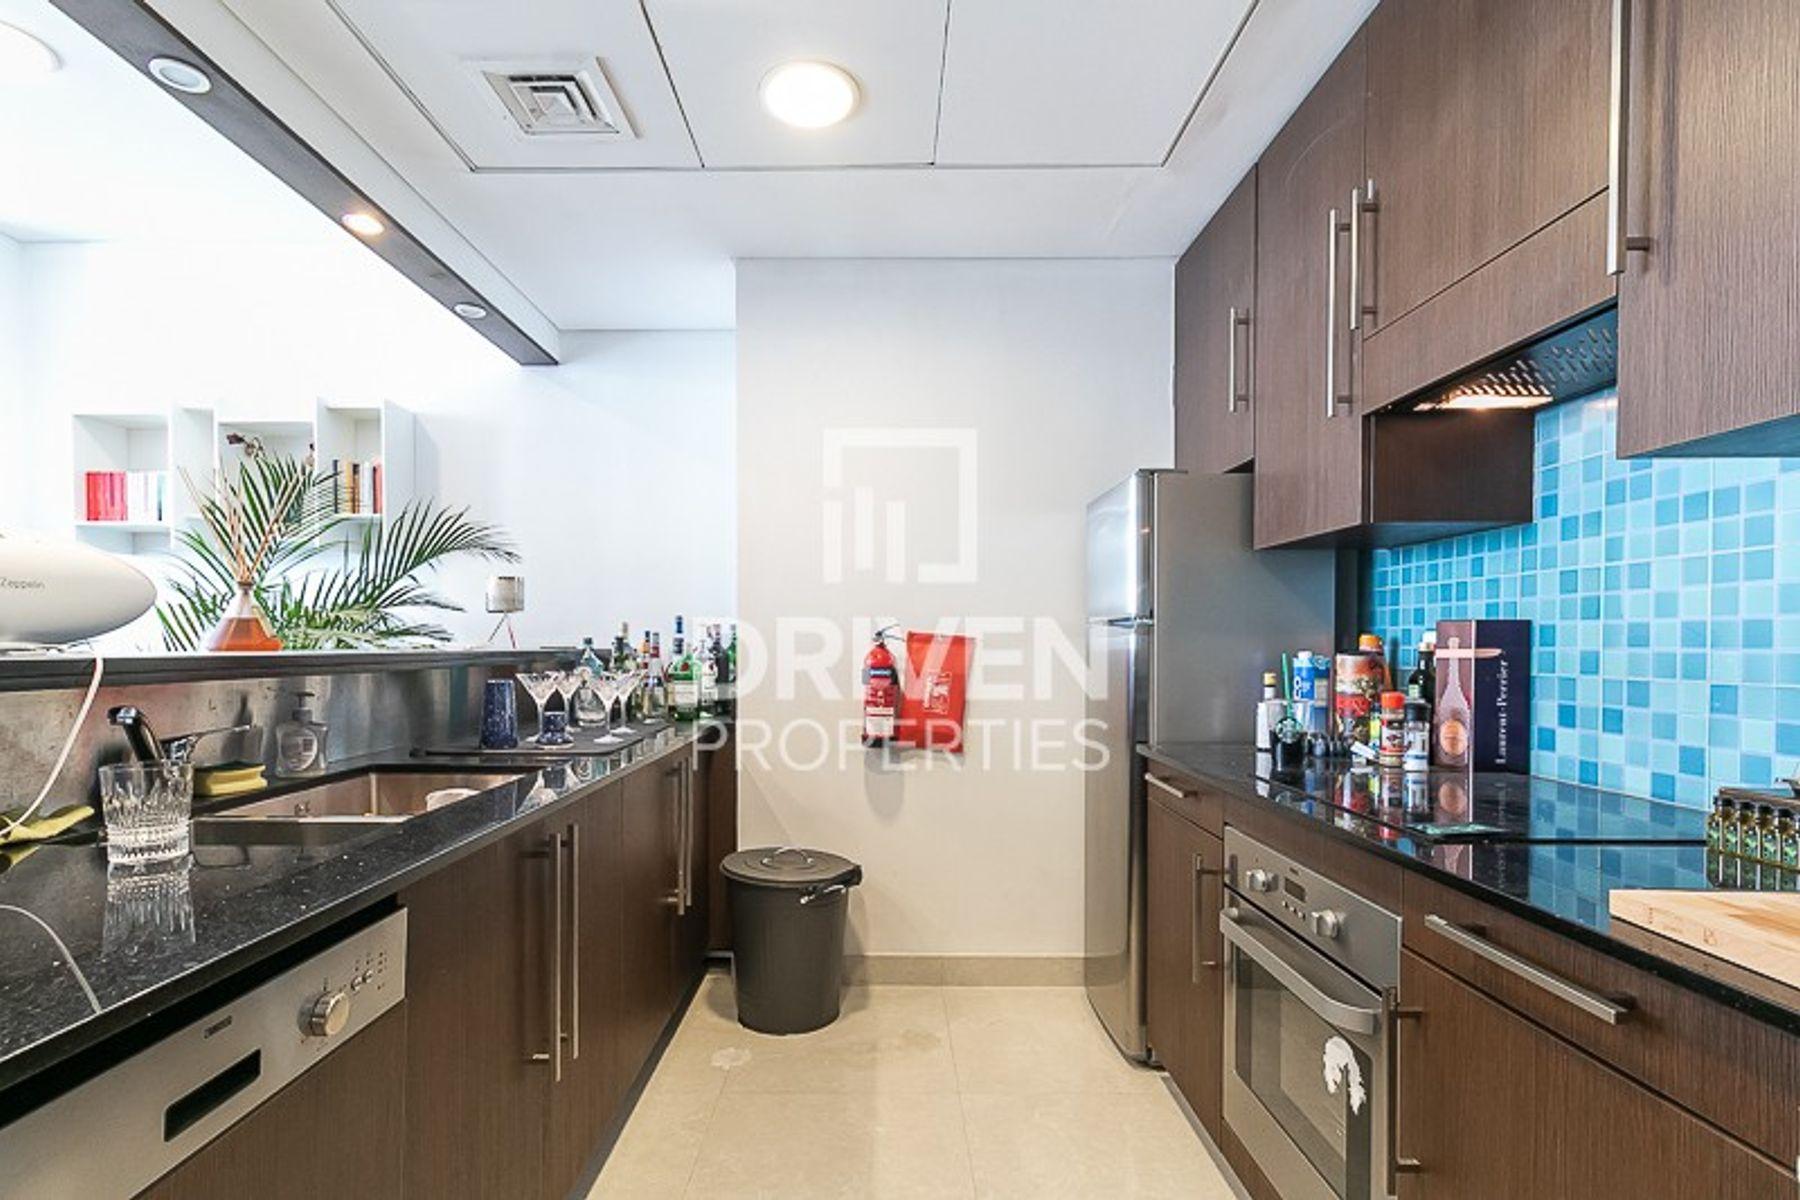 Apartment for Sale in Burj Daman - DIFC